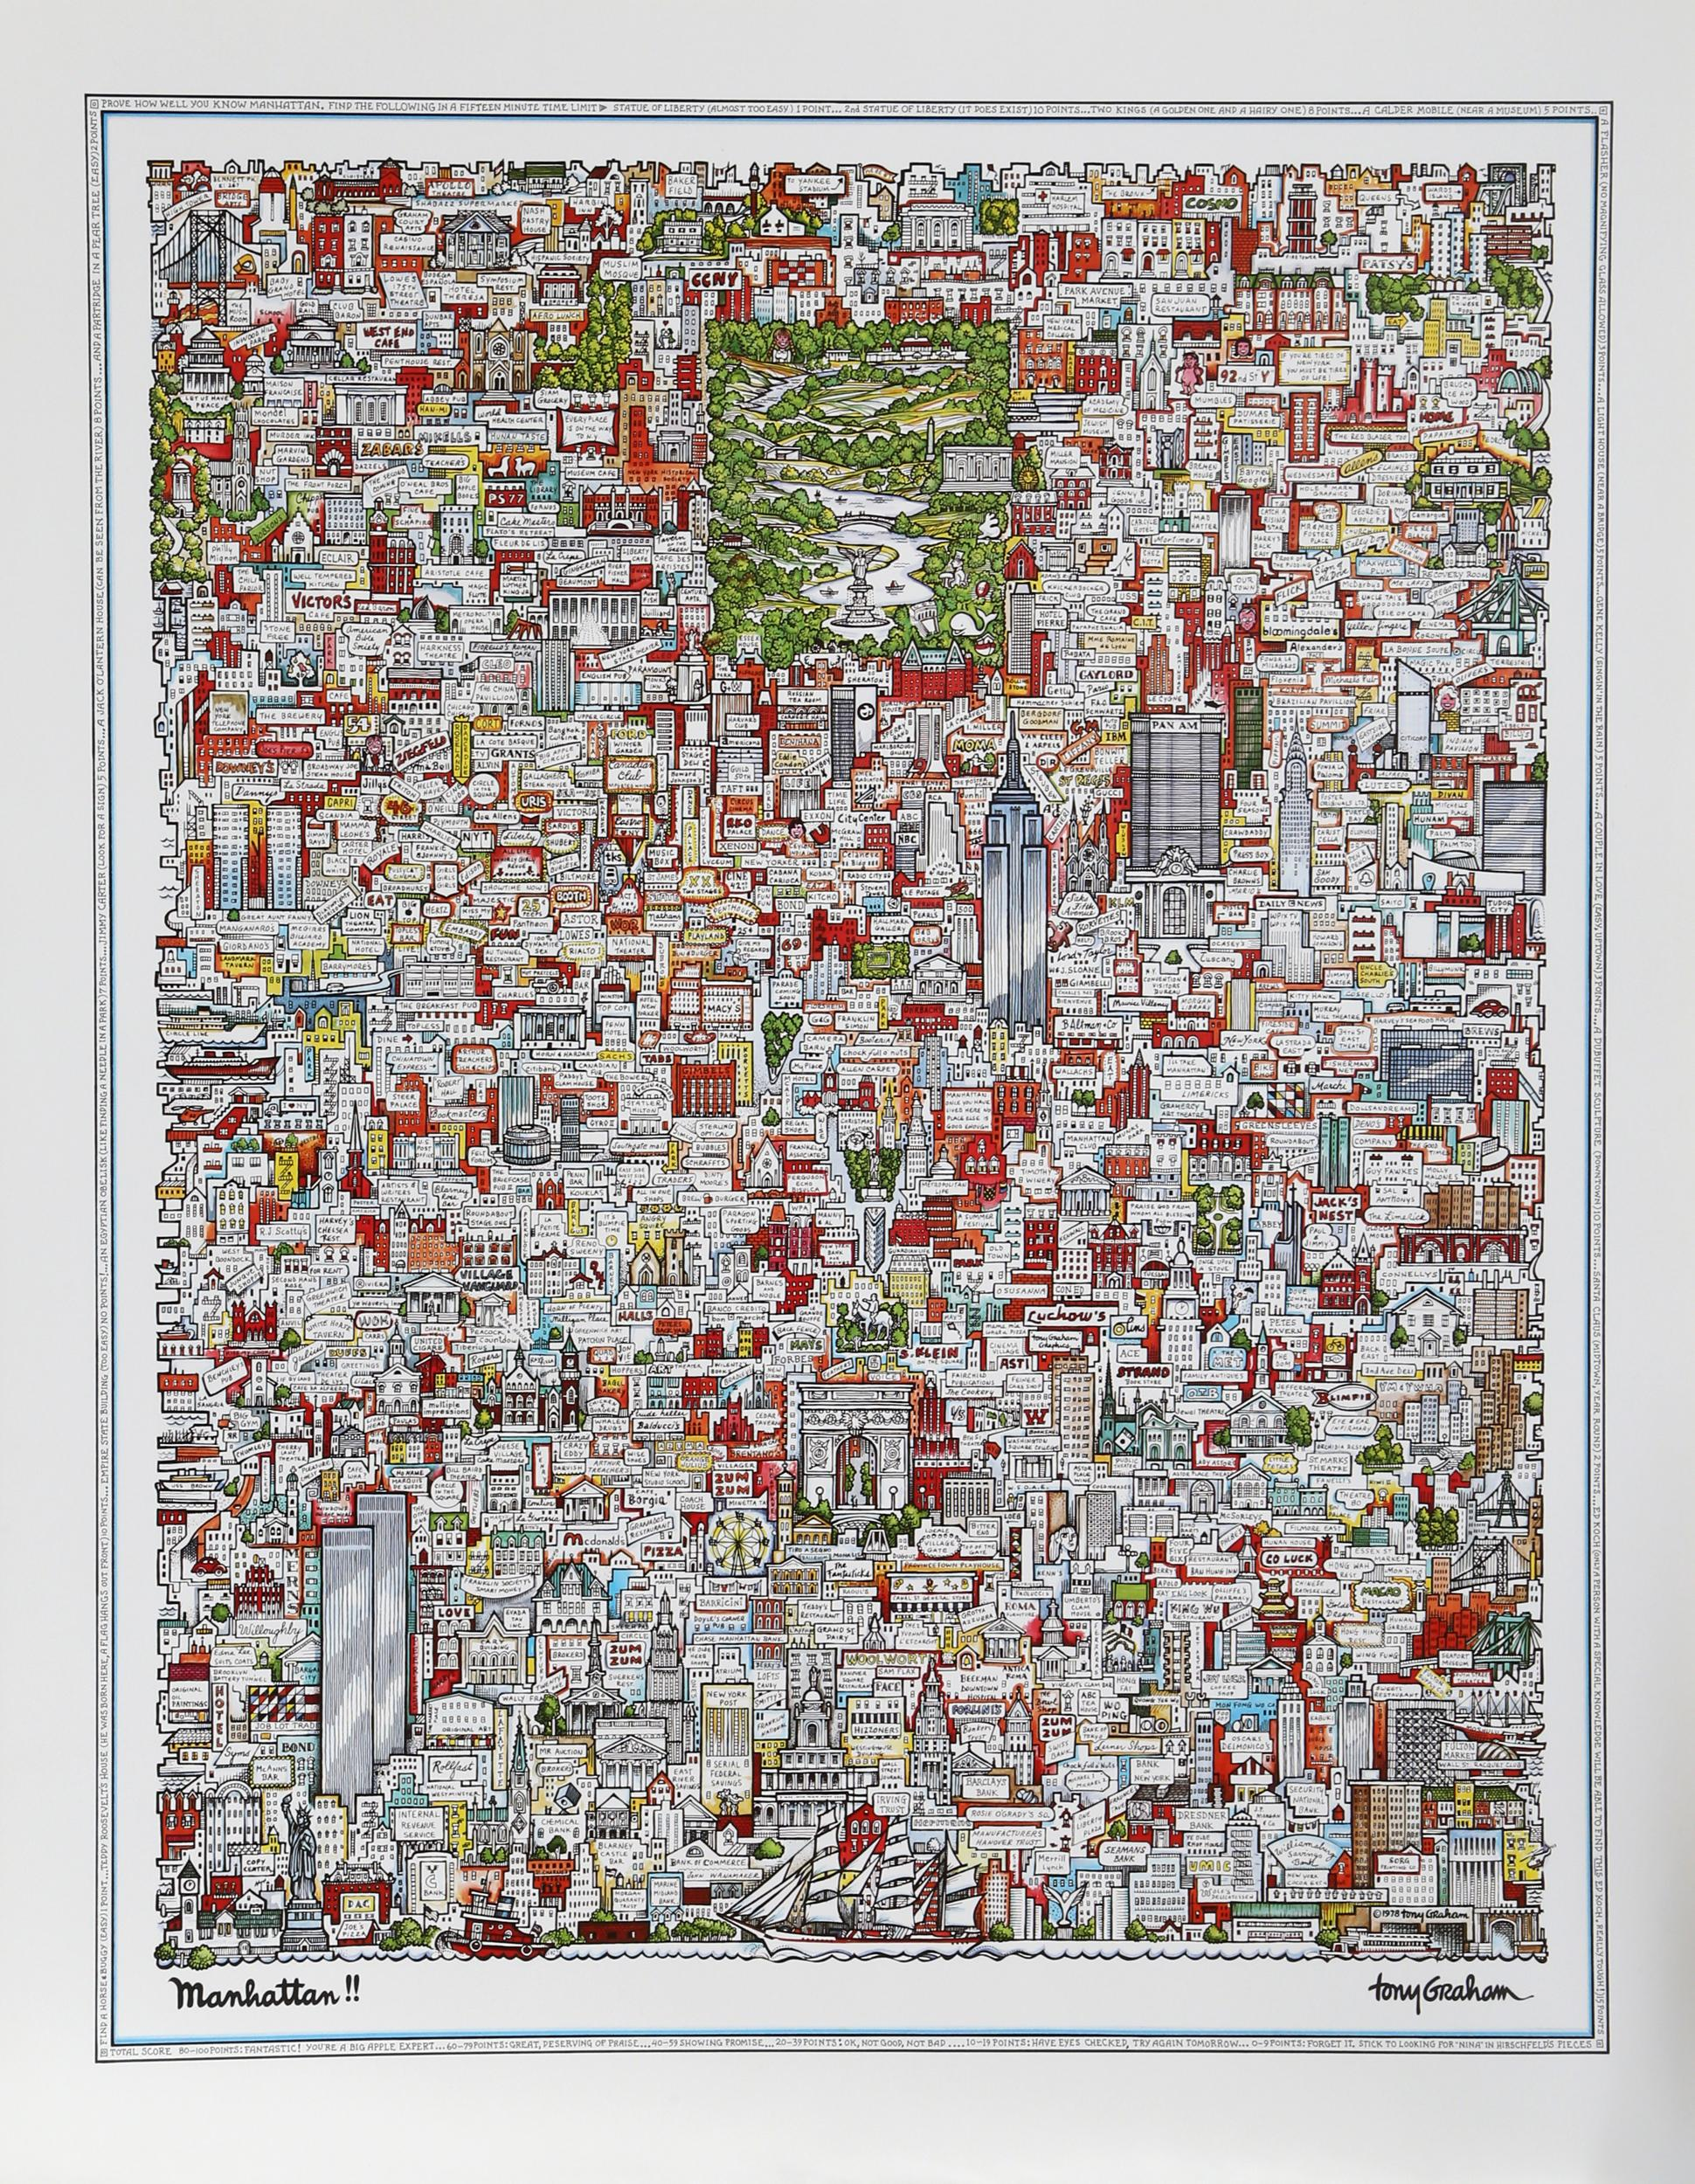 Tony Graham, Manhattan!!, Poster